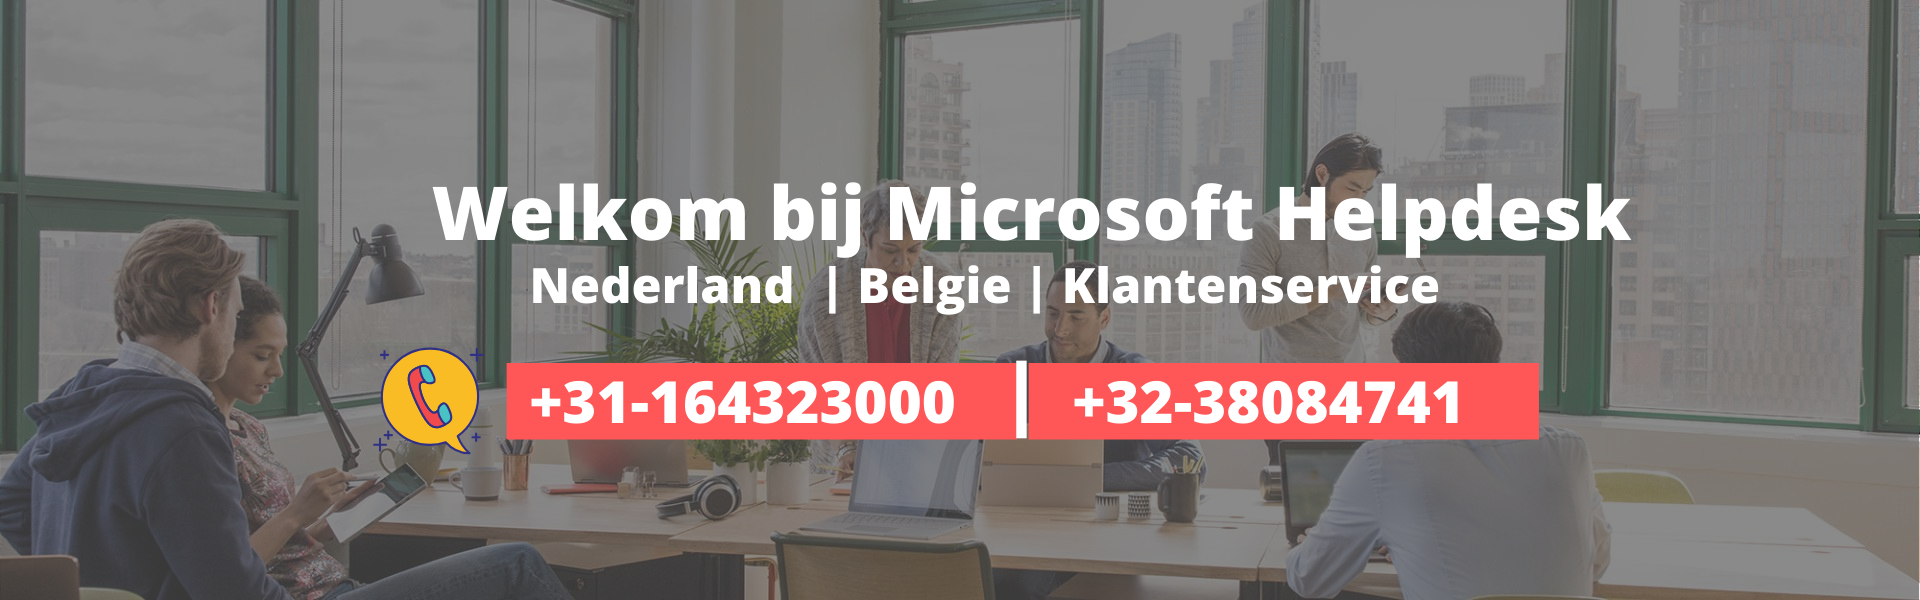 Microsoft Telefoonnummer